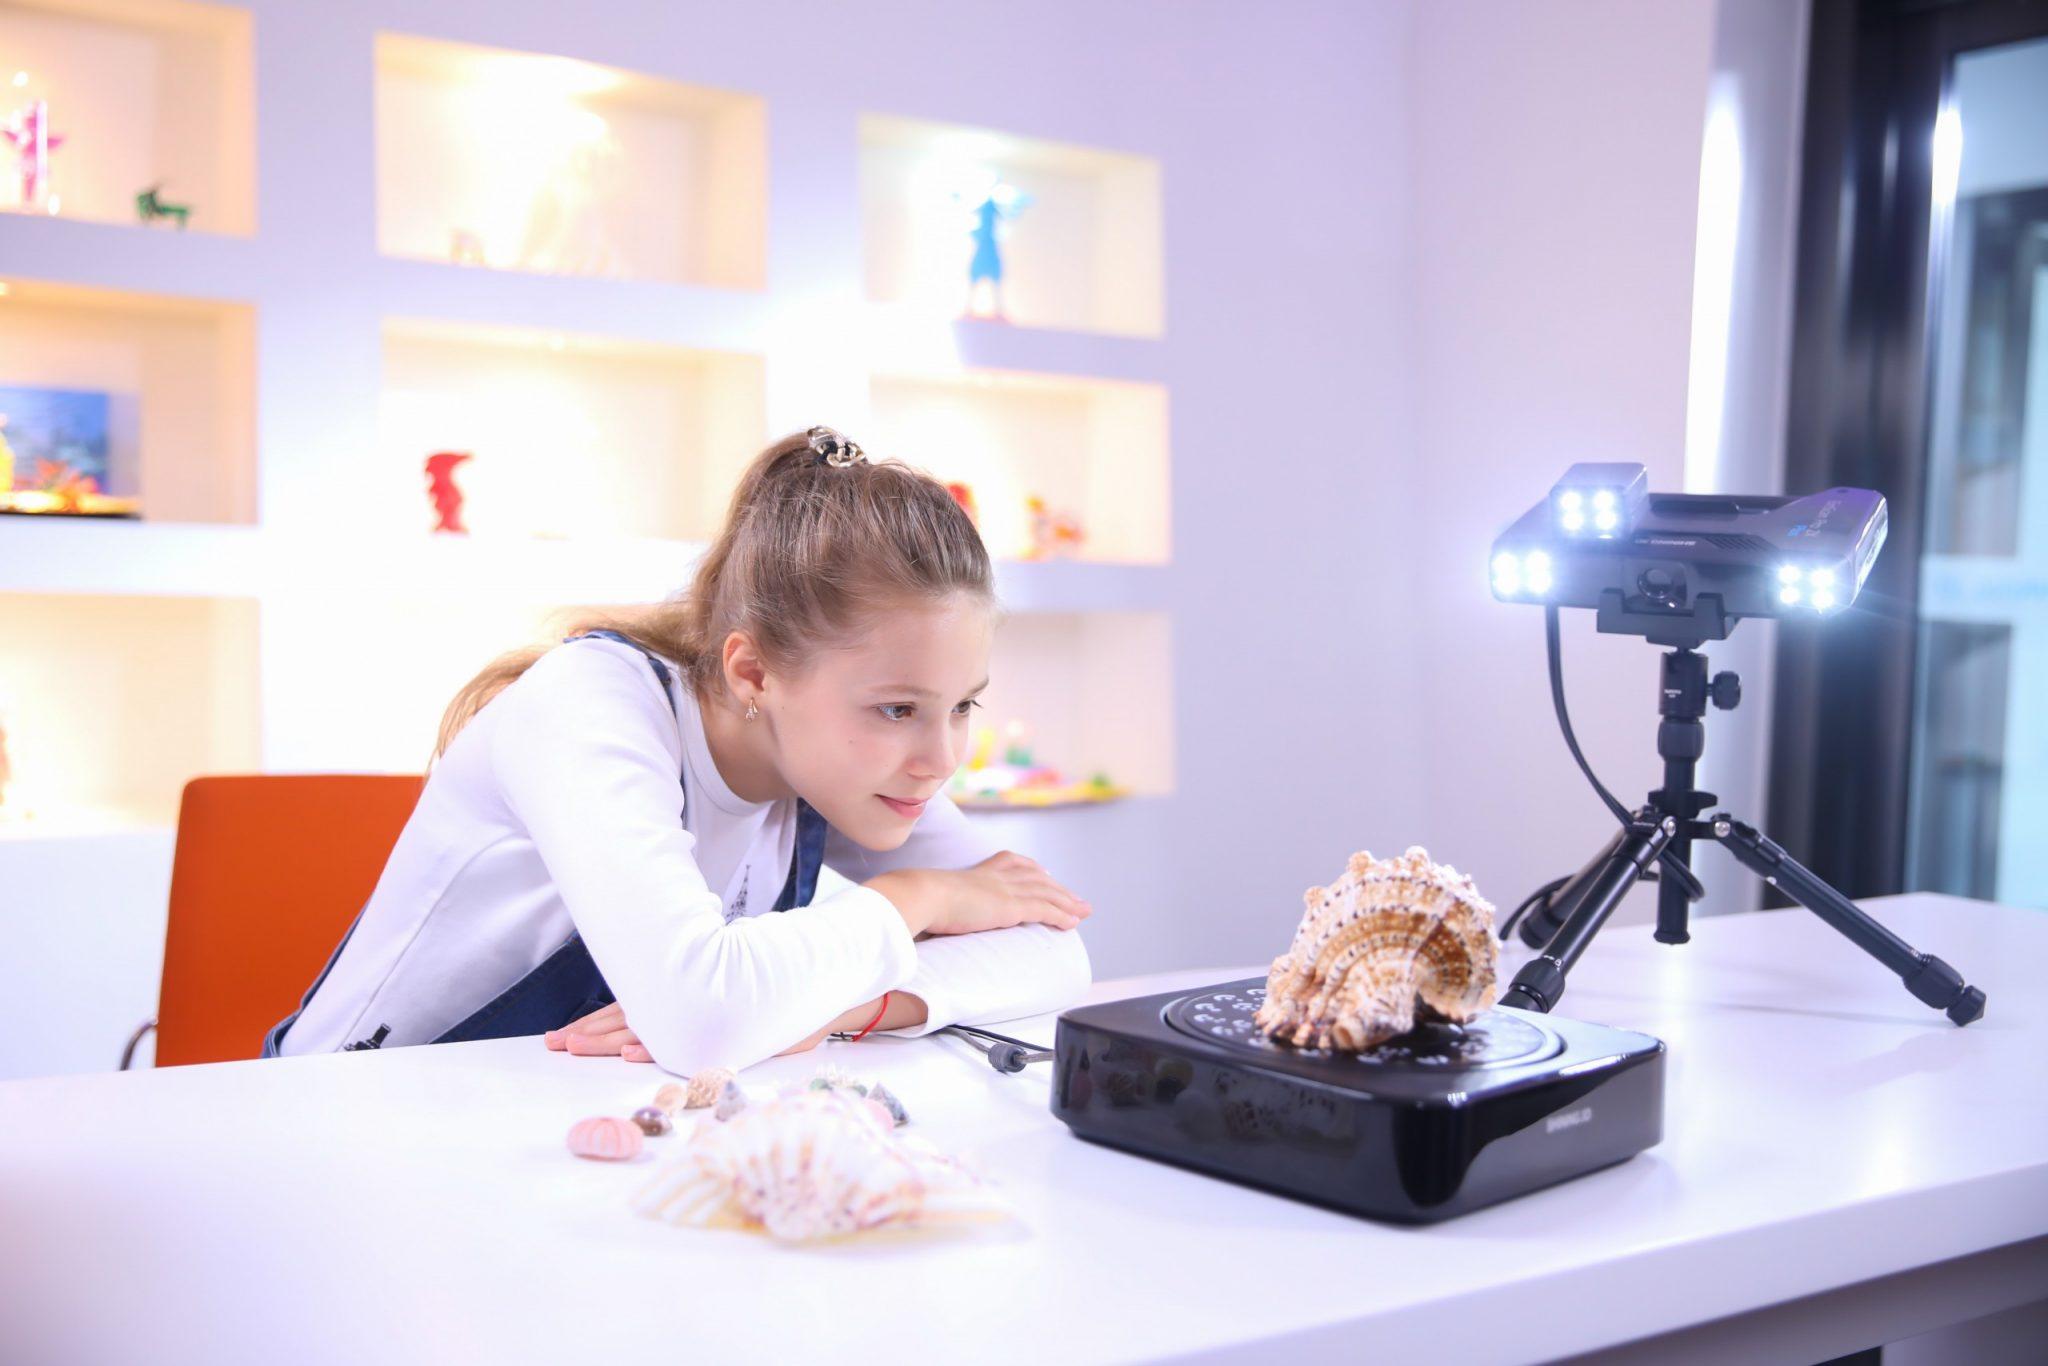 3D Scanning for education